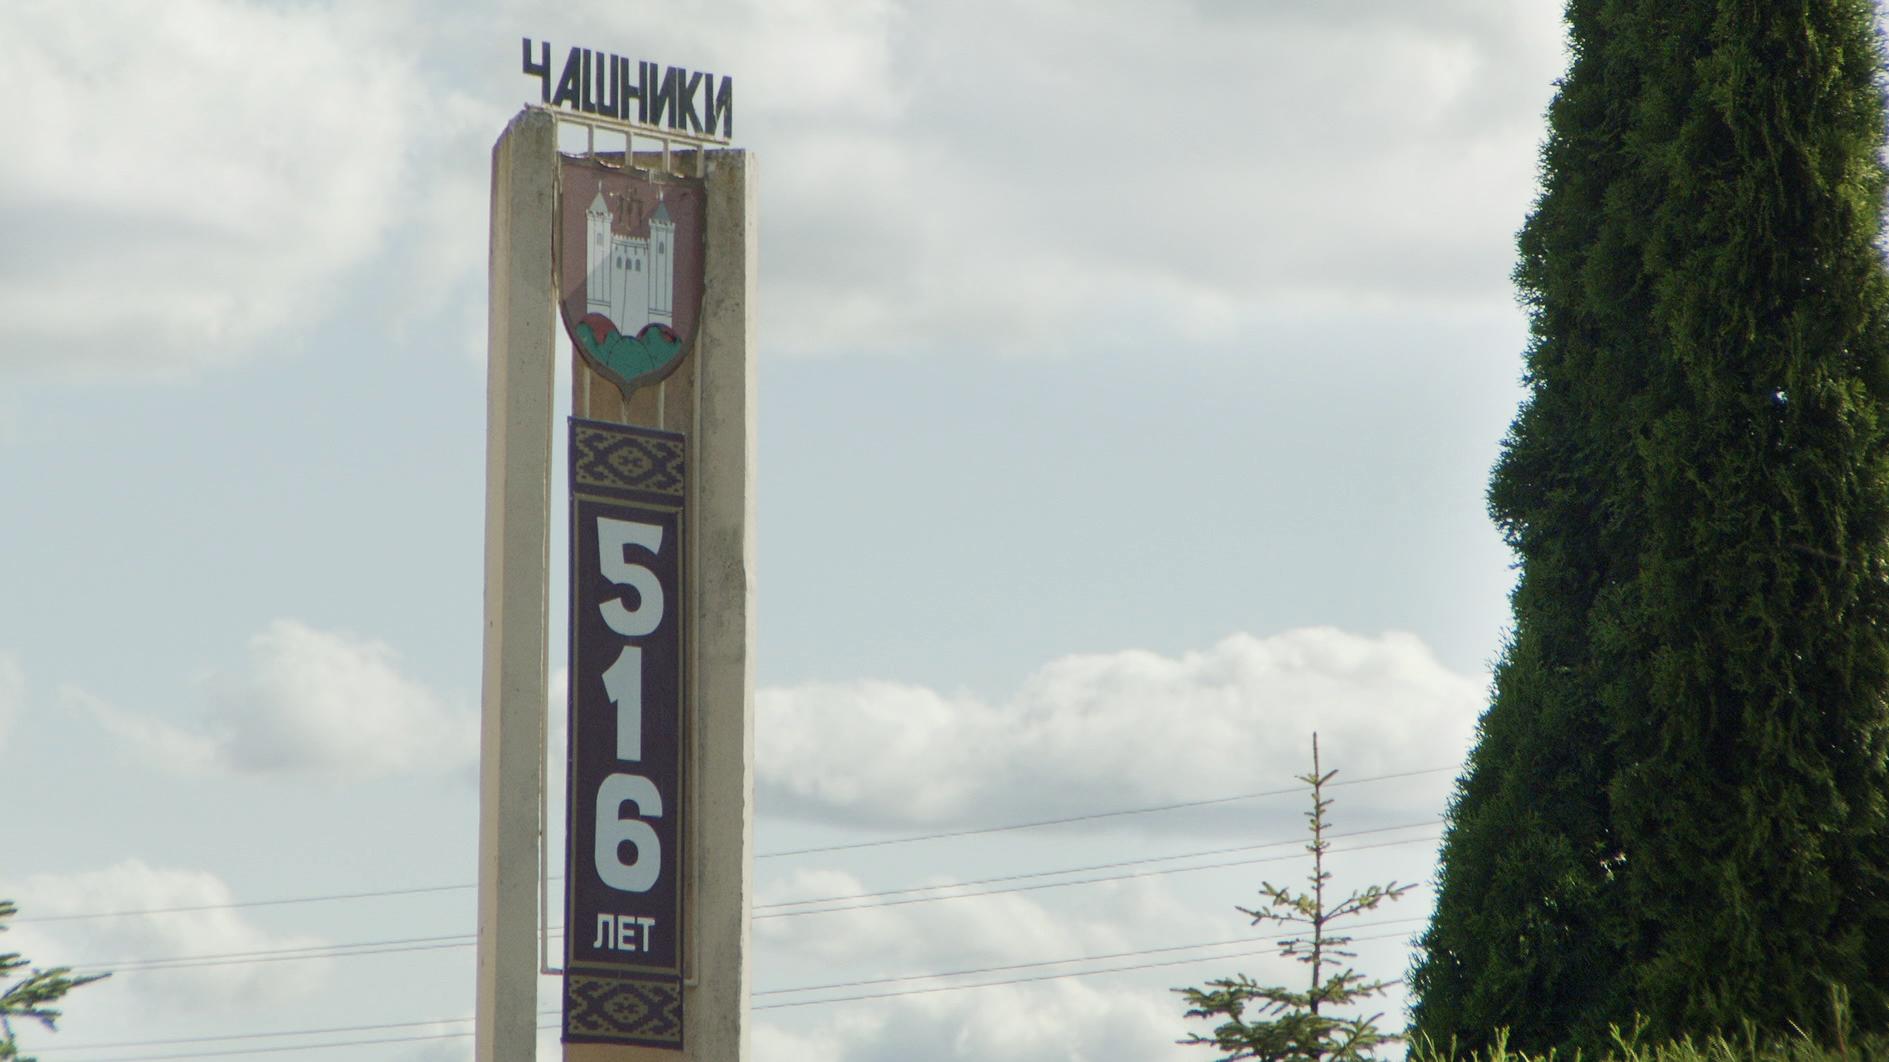 chashniki - Чашники отпраздновали День города (видео)